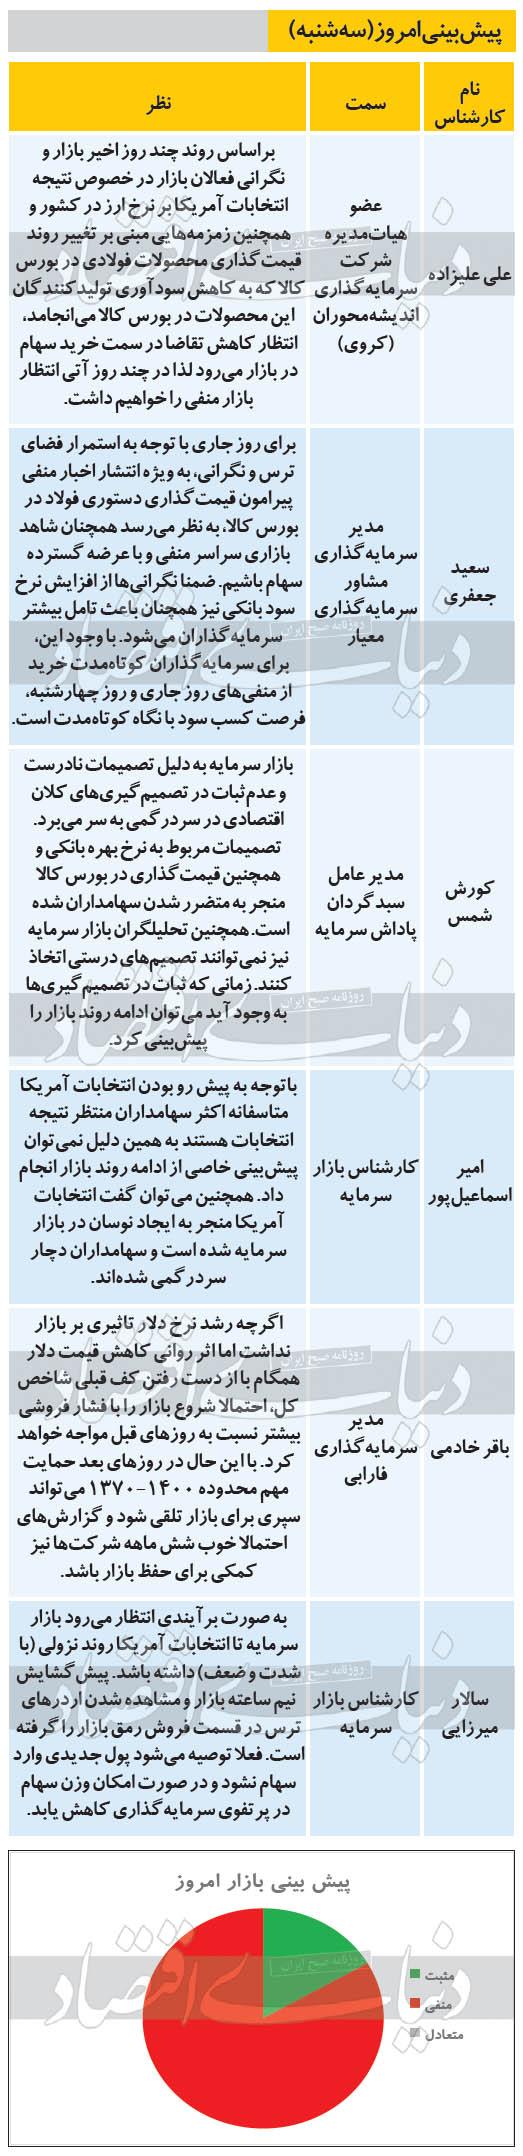 پیشبینی بورس29 مهر 99